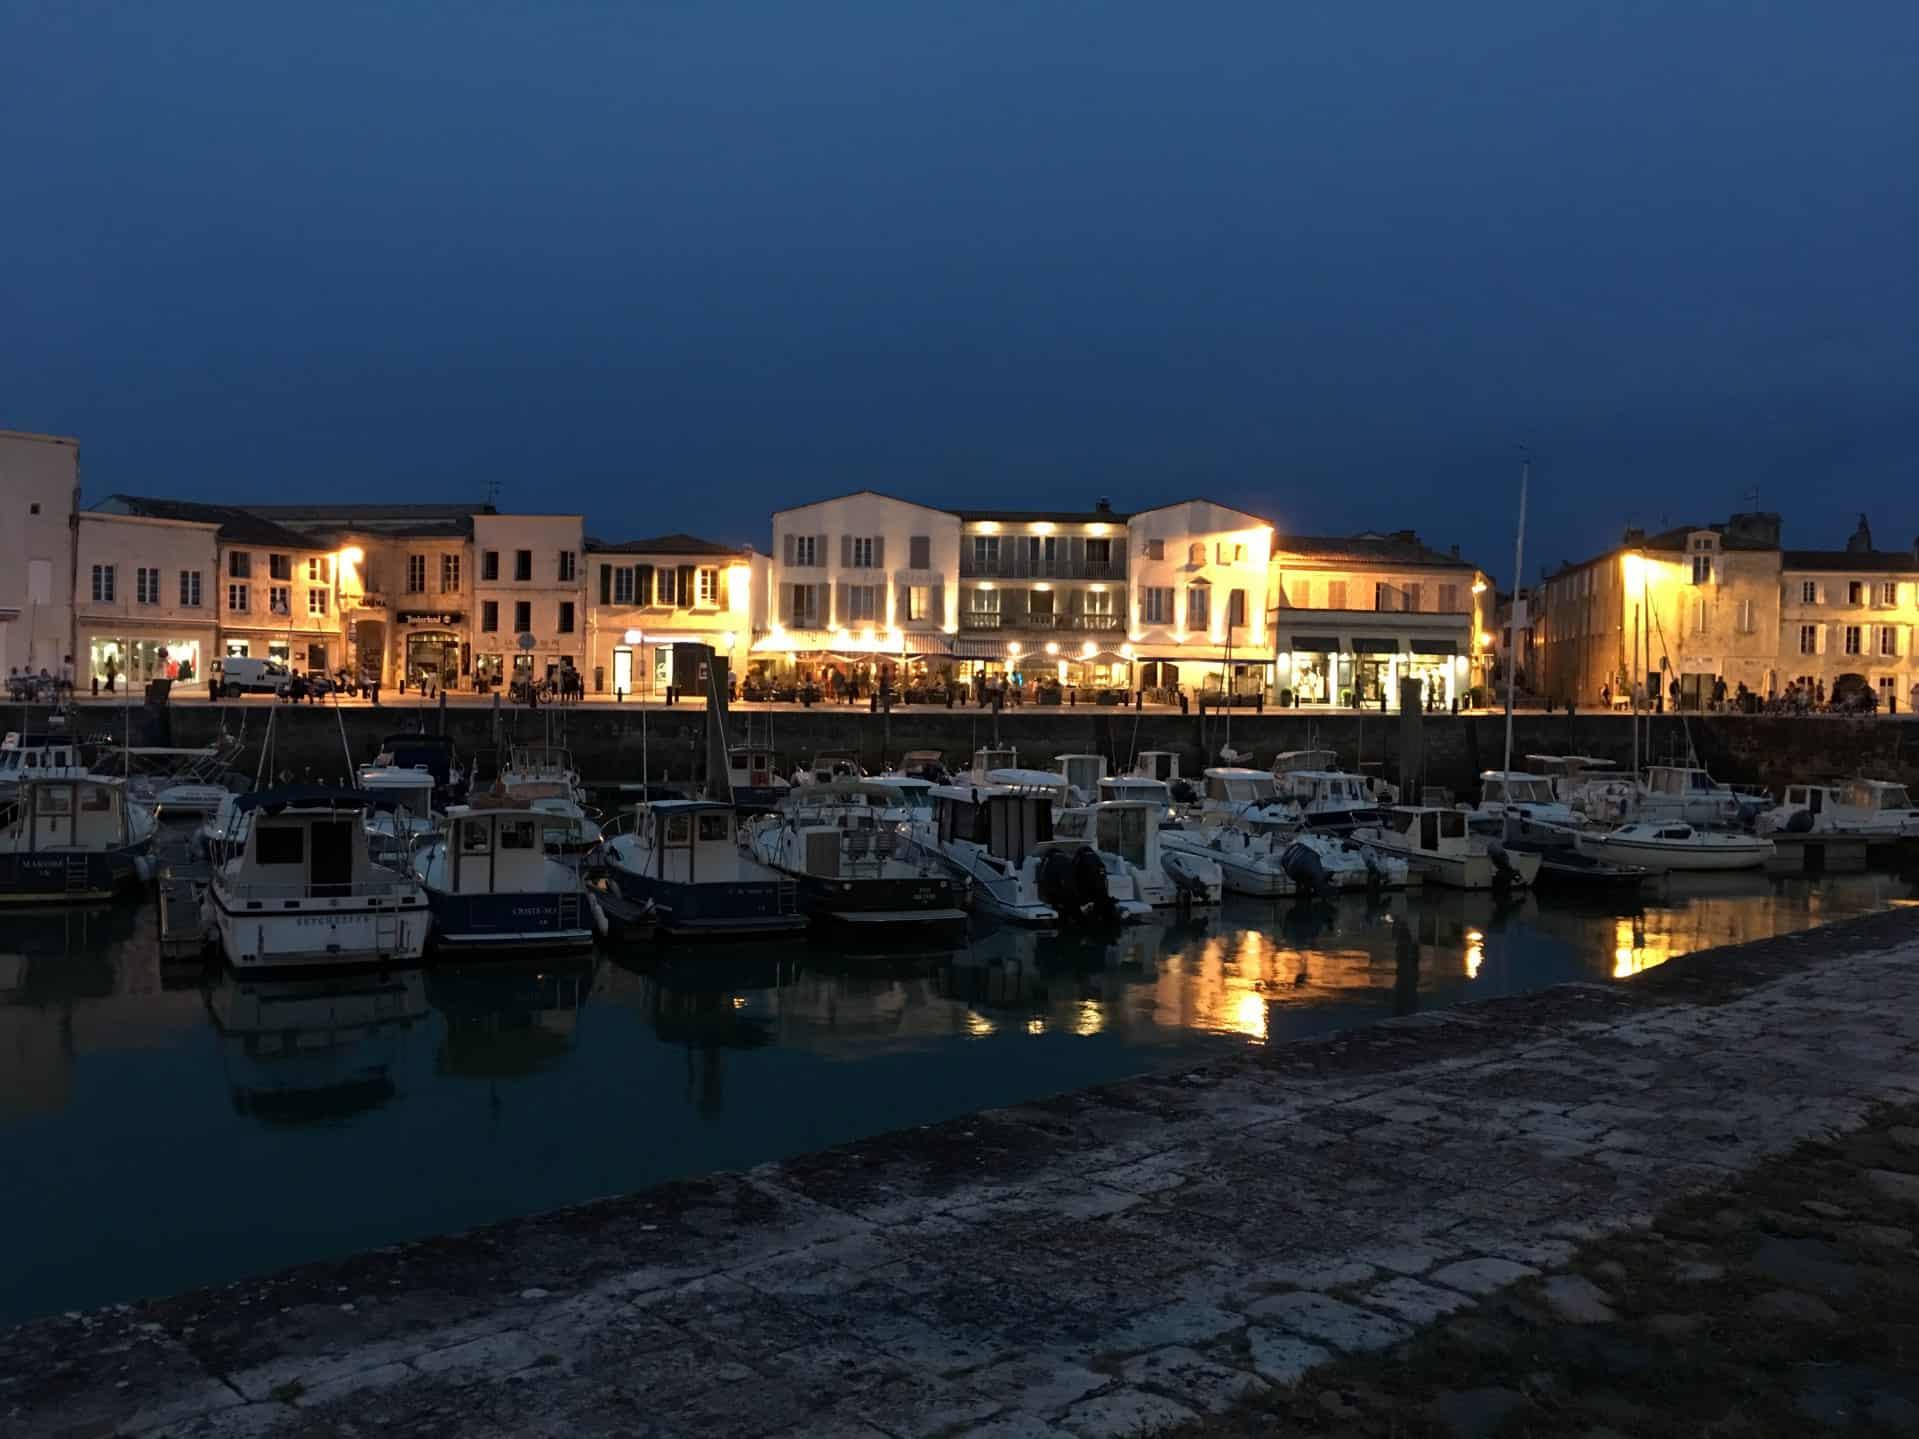 Marina in Ile de Re at night